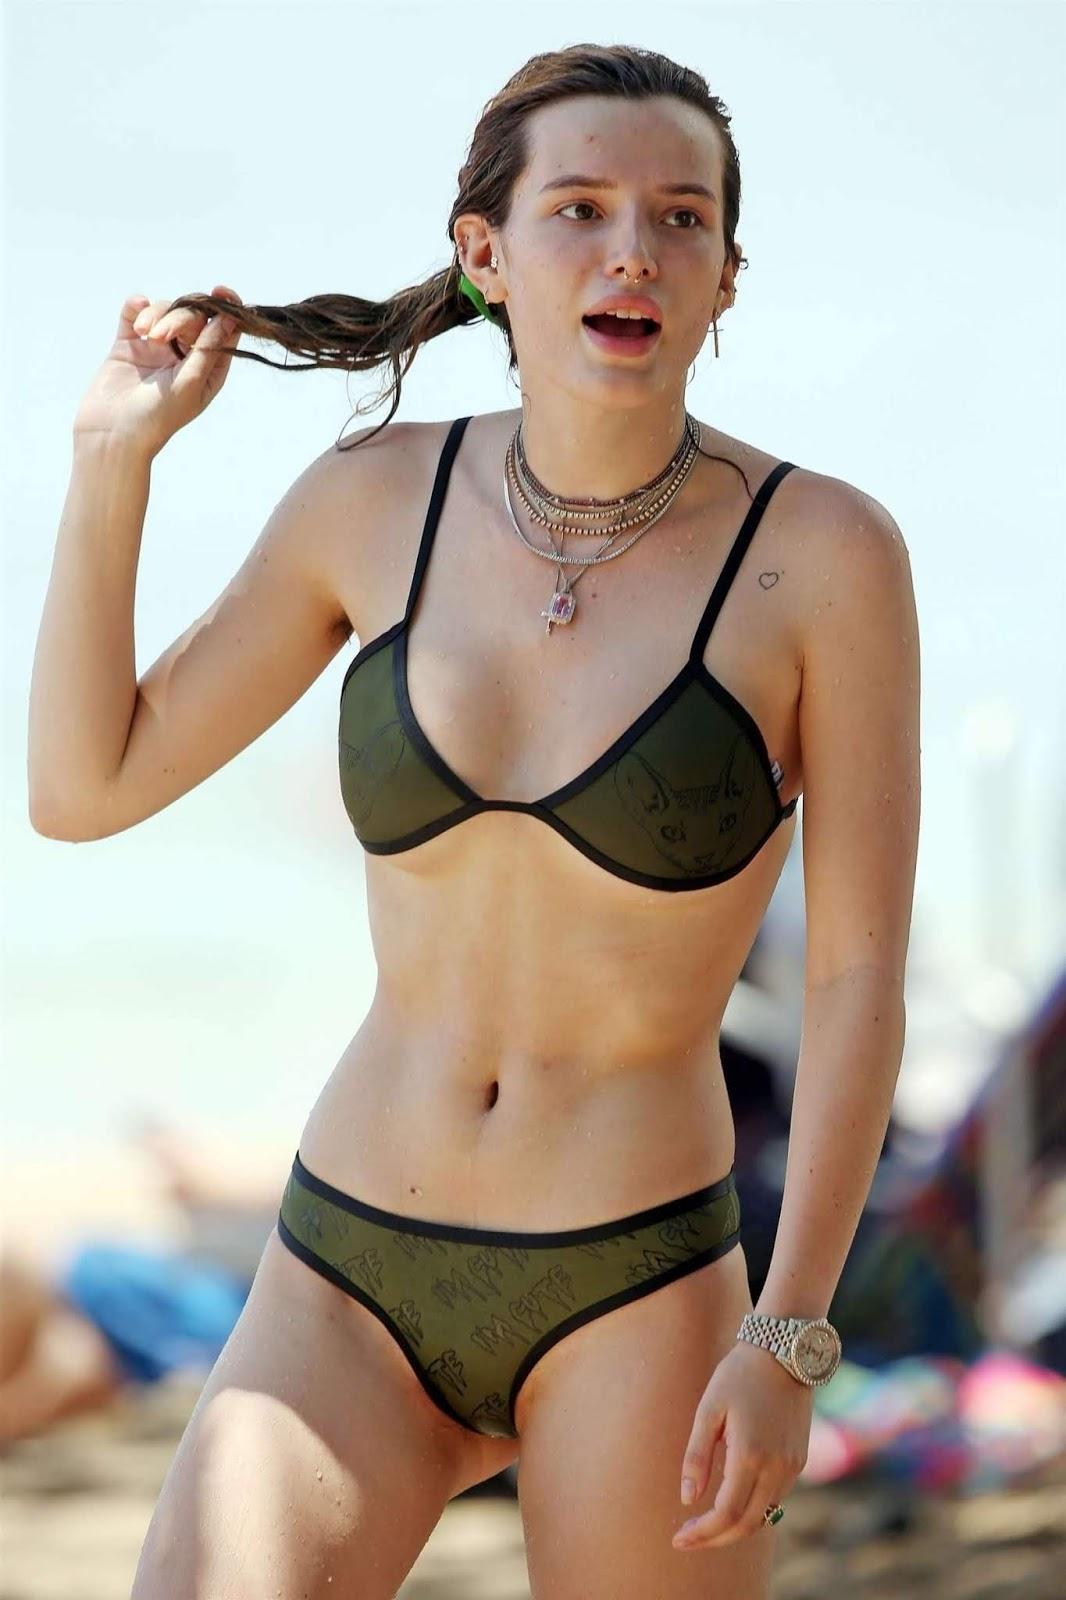 Cleavage Peta Wilson nude (91 photo), Pussy, Bikini, Selfie, braless 2006